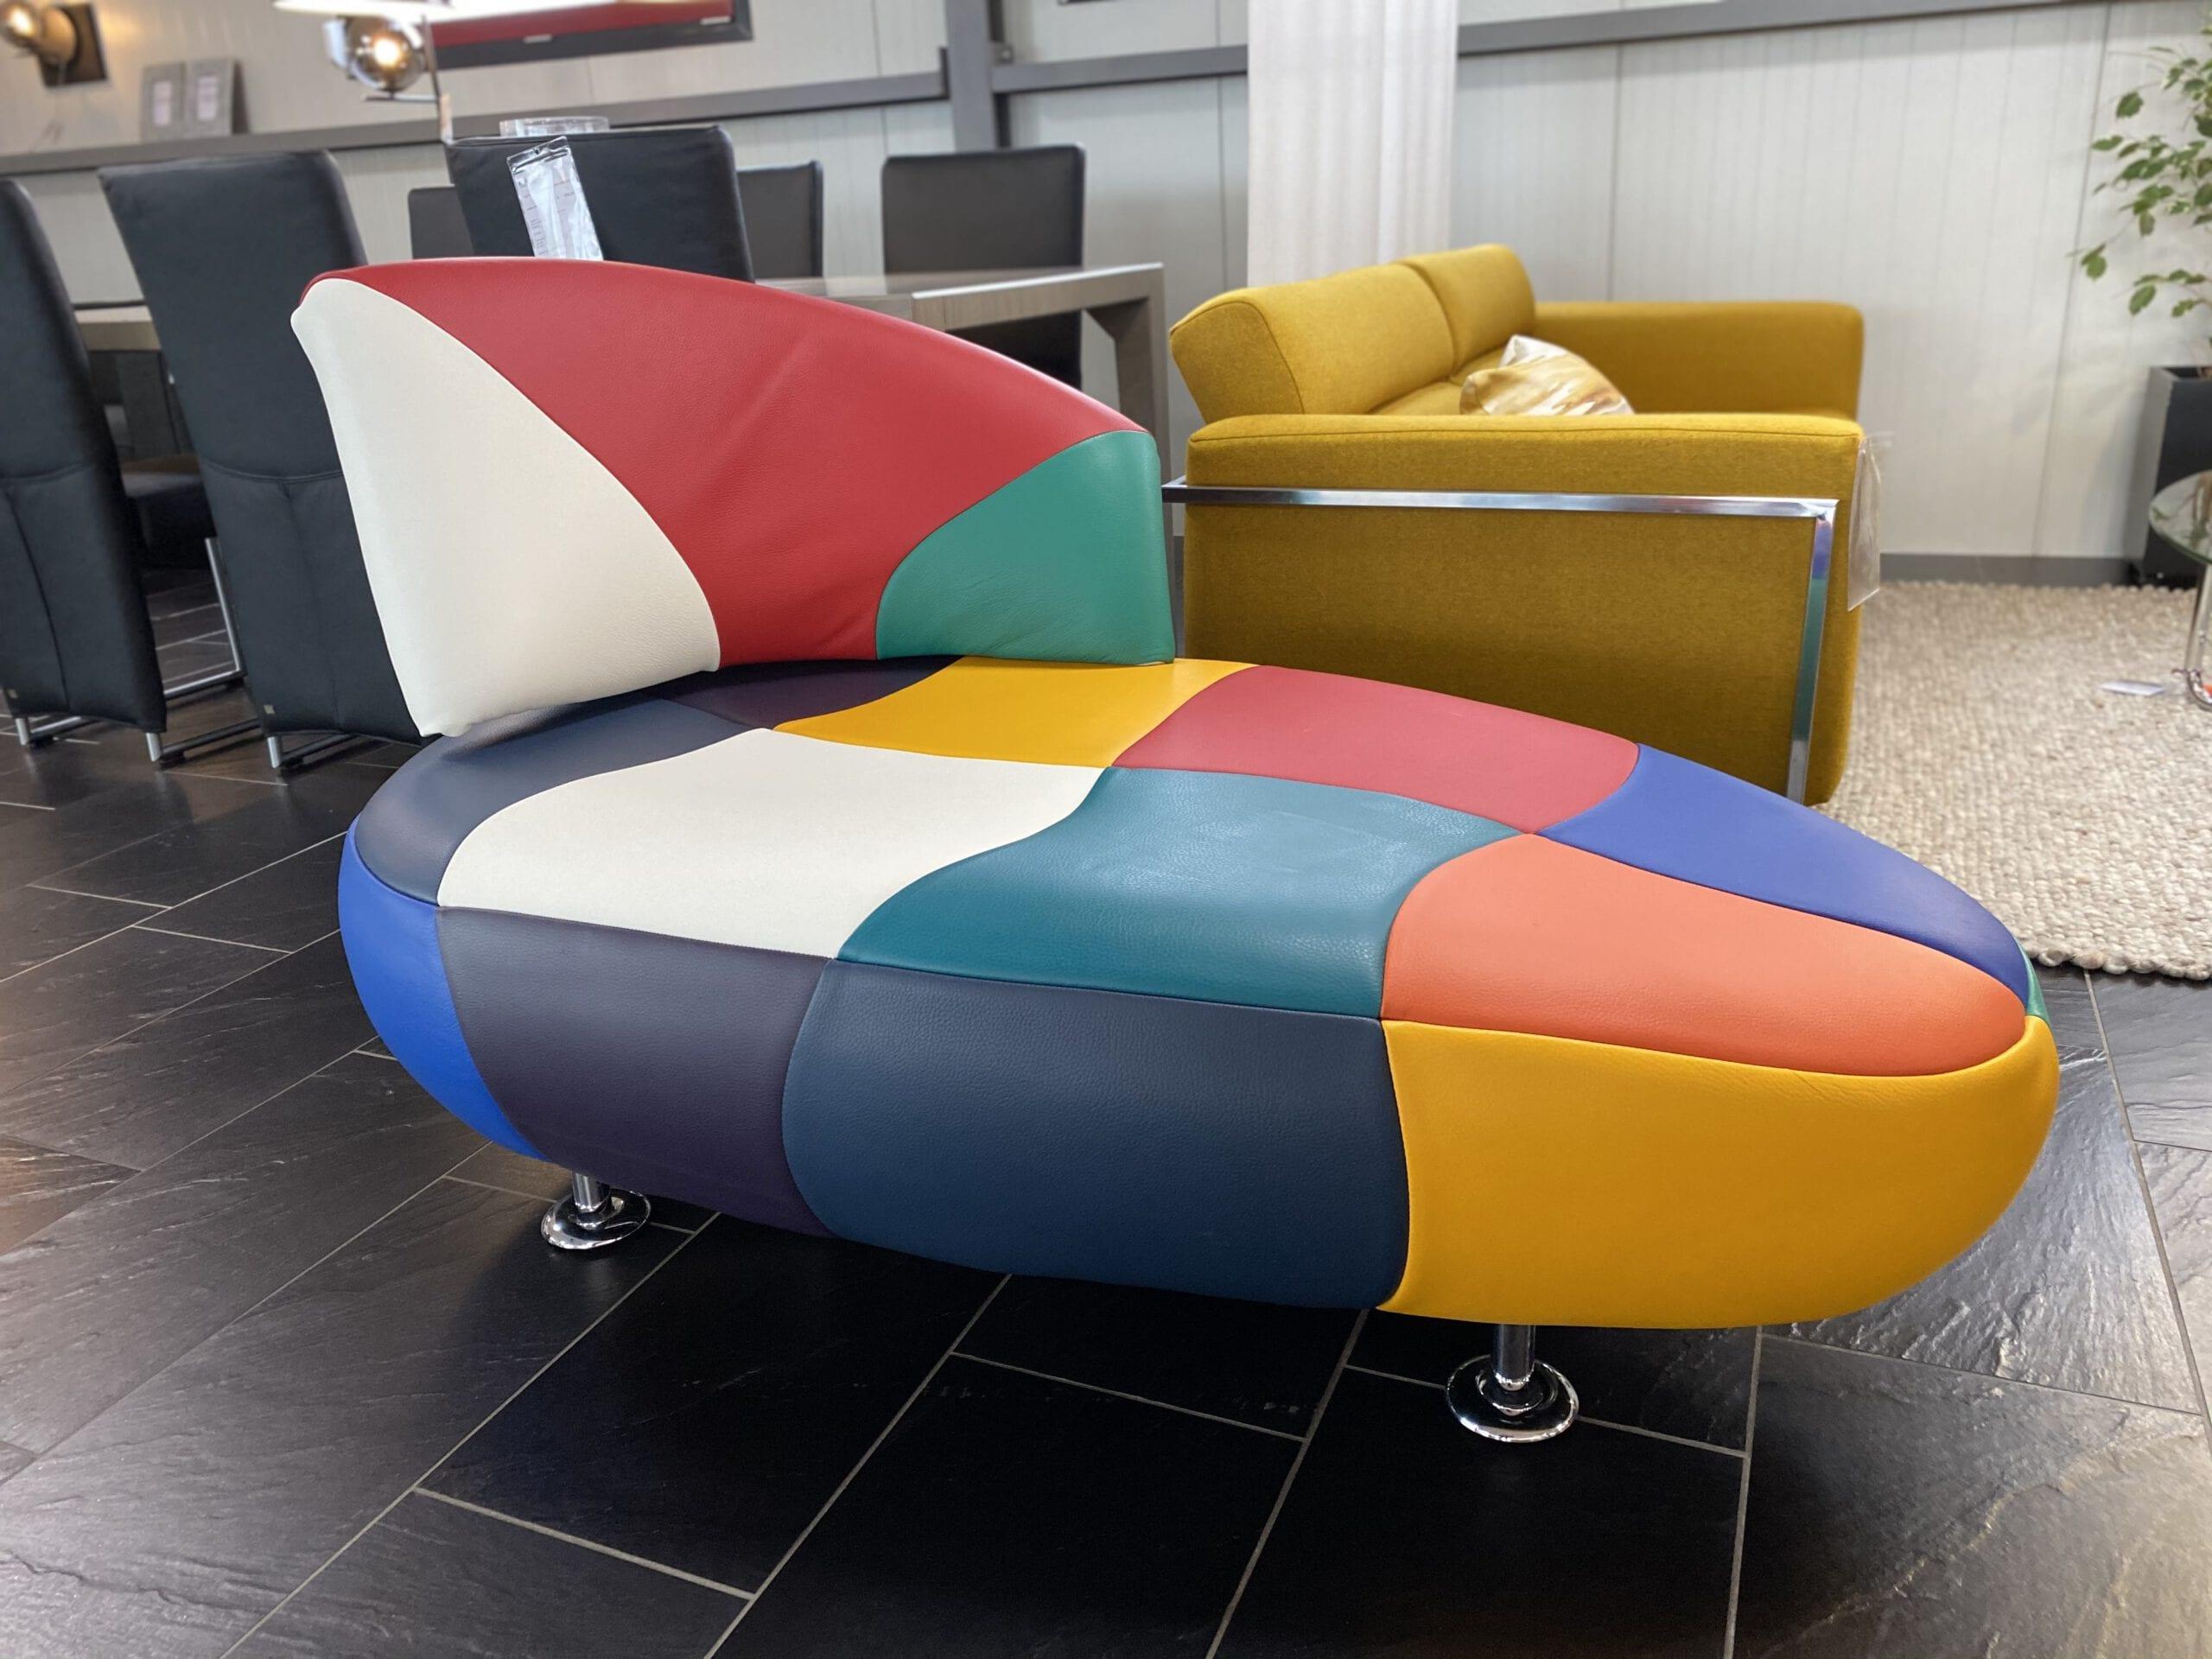 Leolux Kikko multicolor fauteuil  - Refurbished